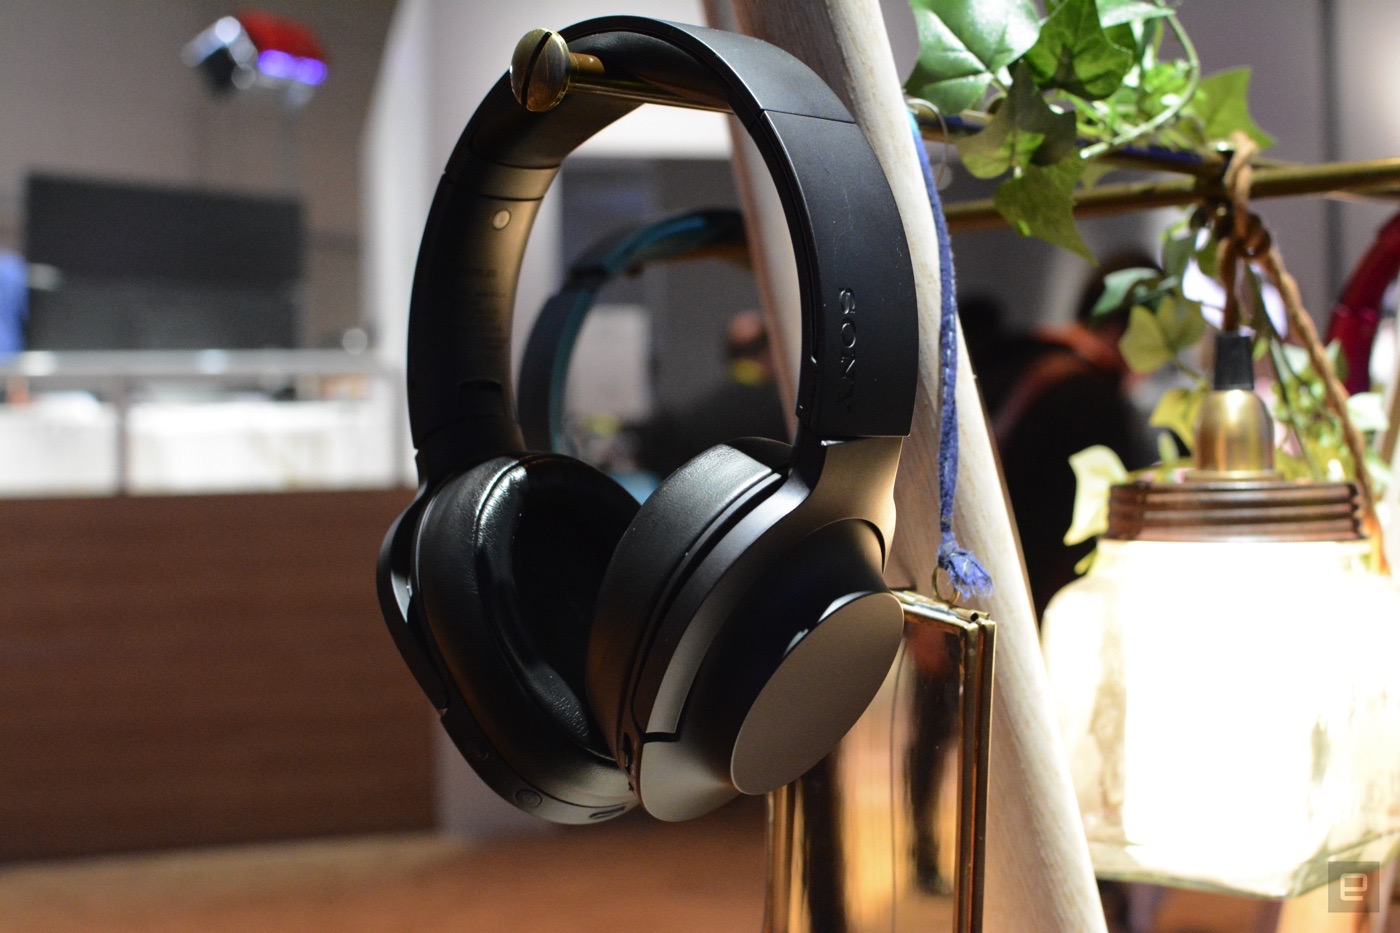 Sony's new wireless headphones mix of comfort and great audio